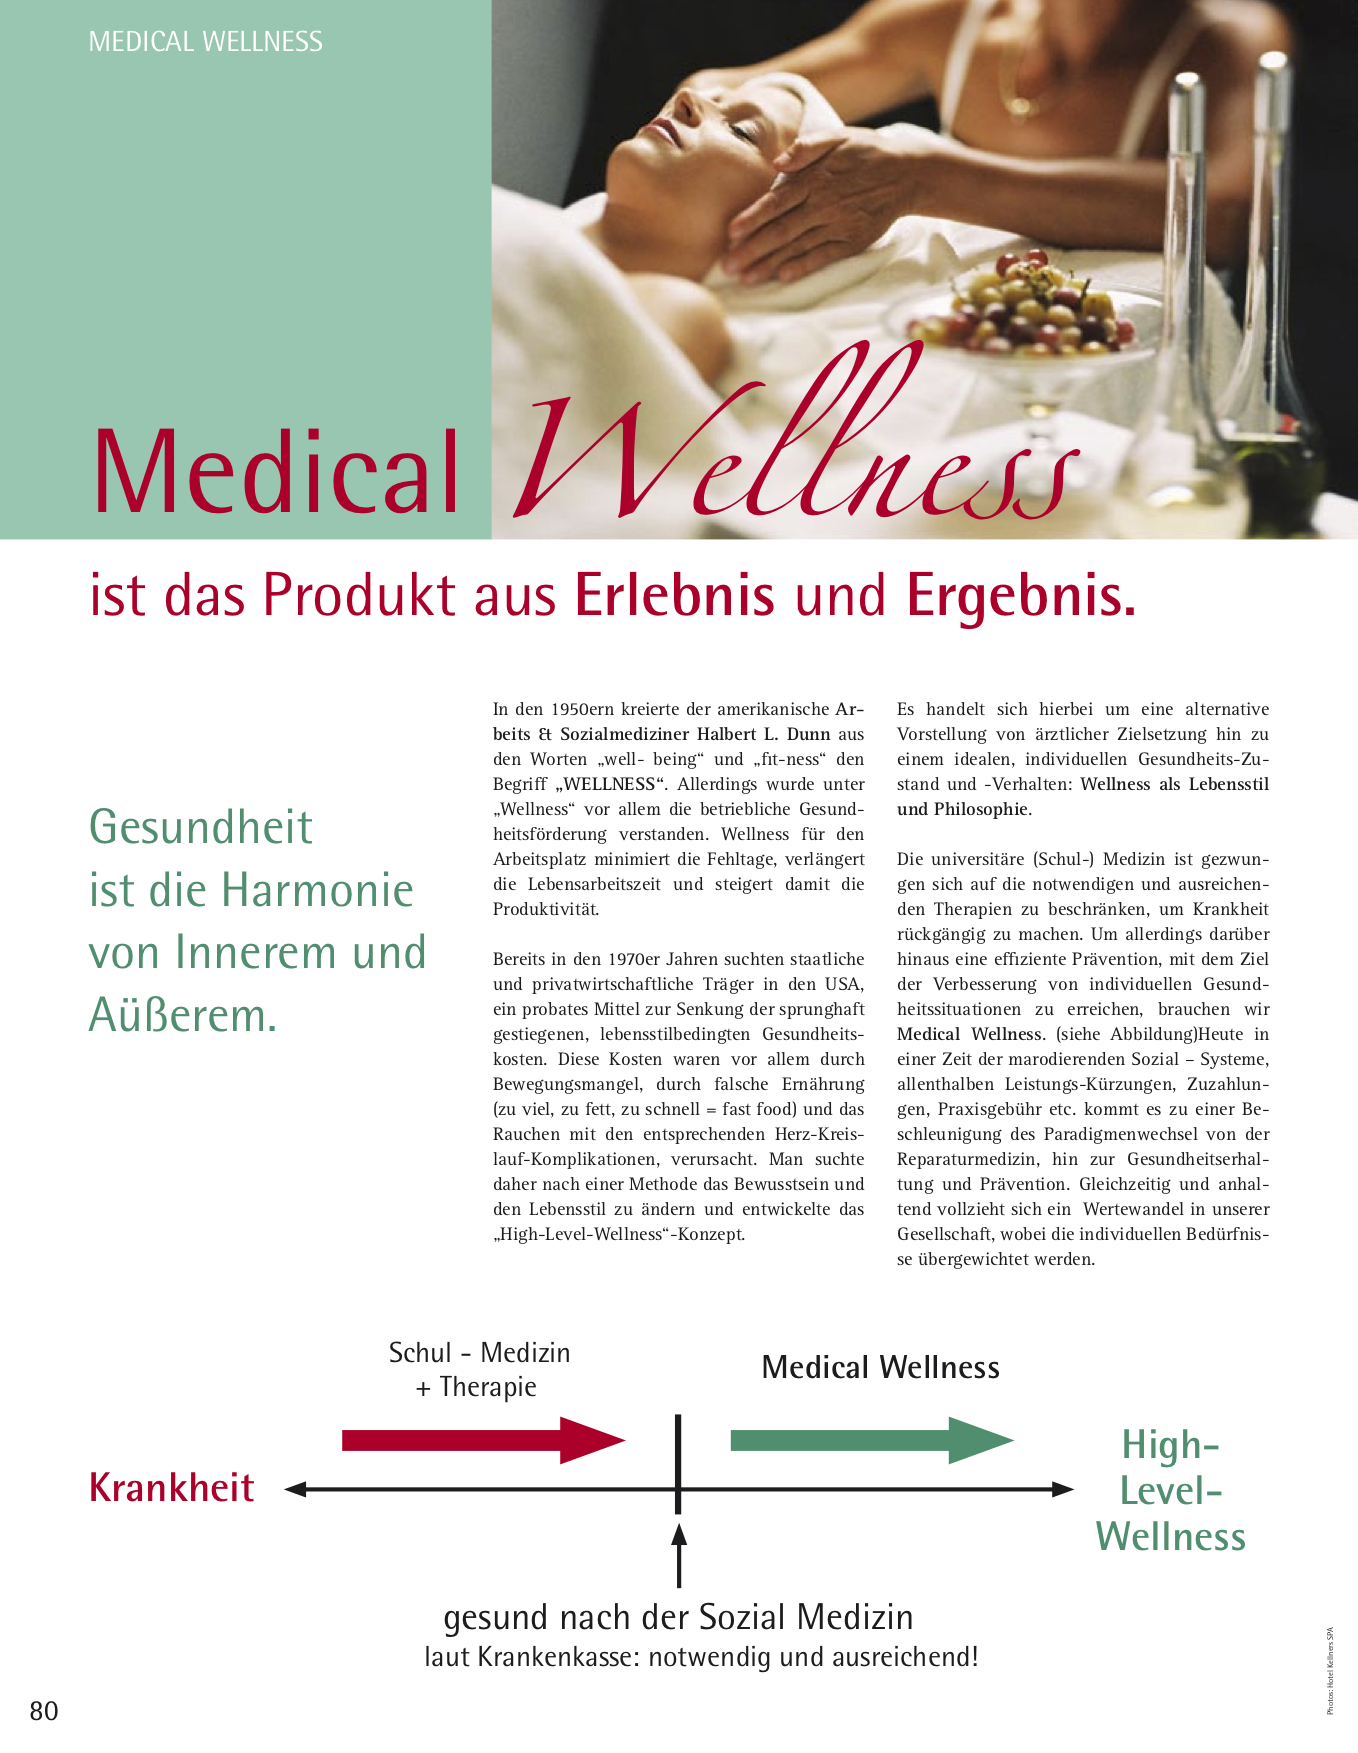 Medicalwellness